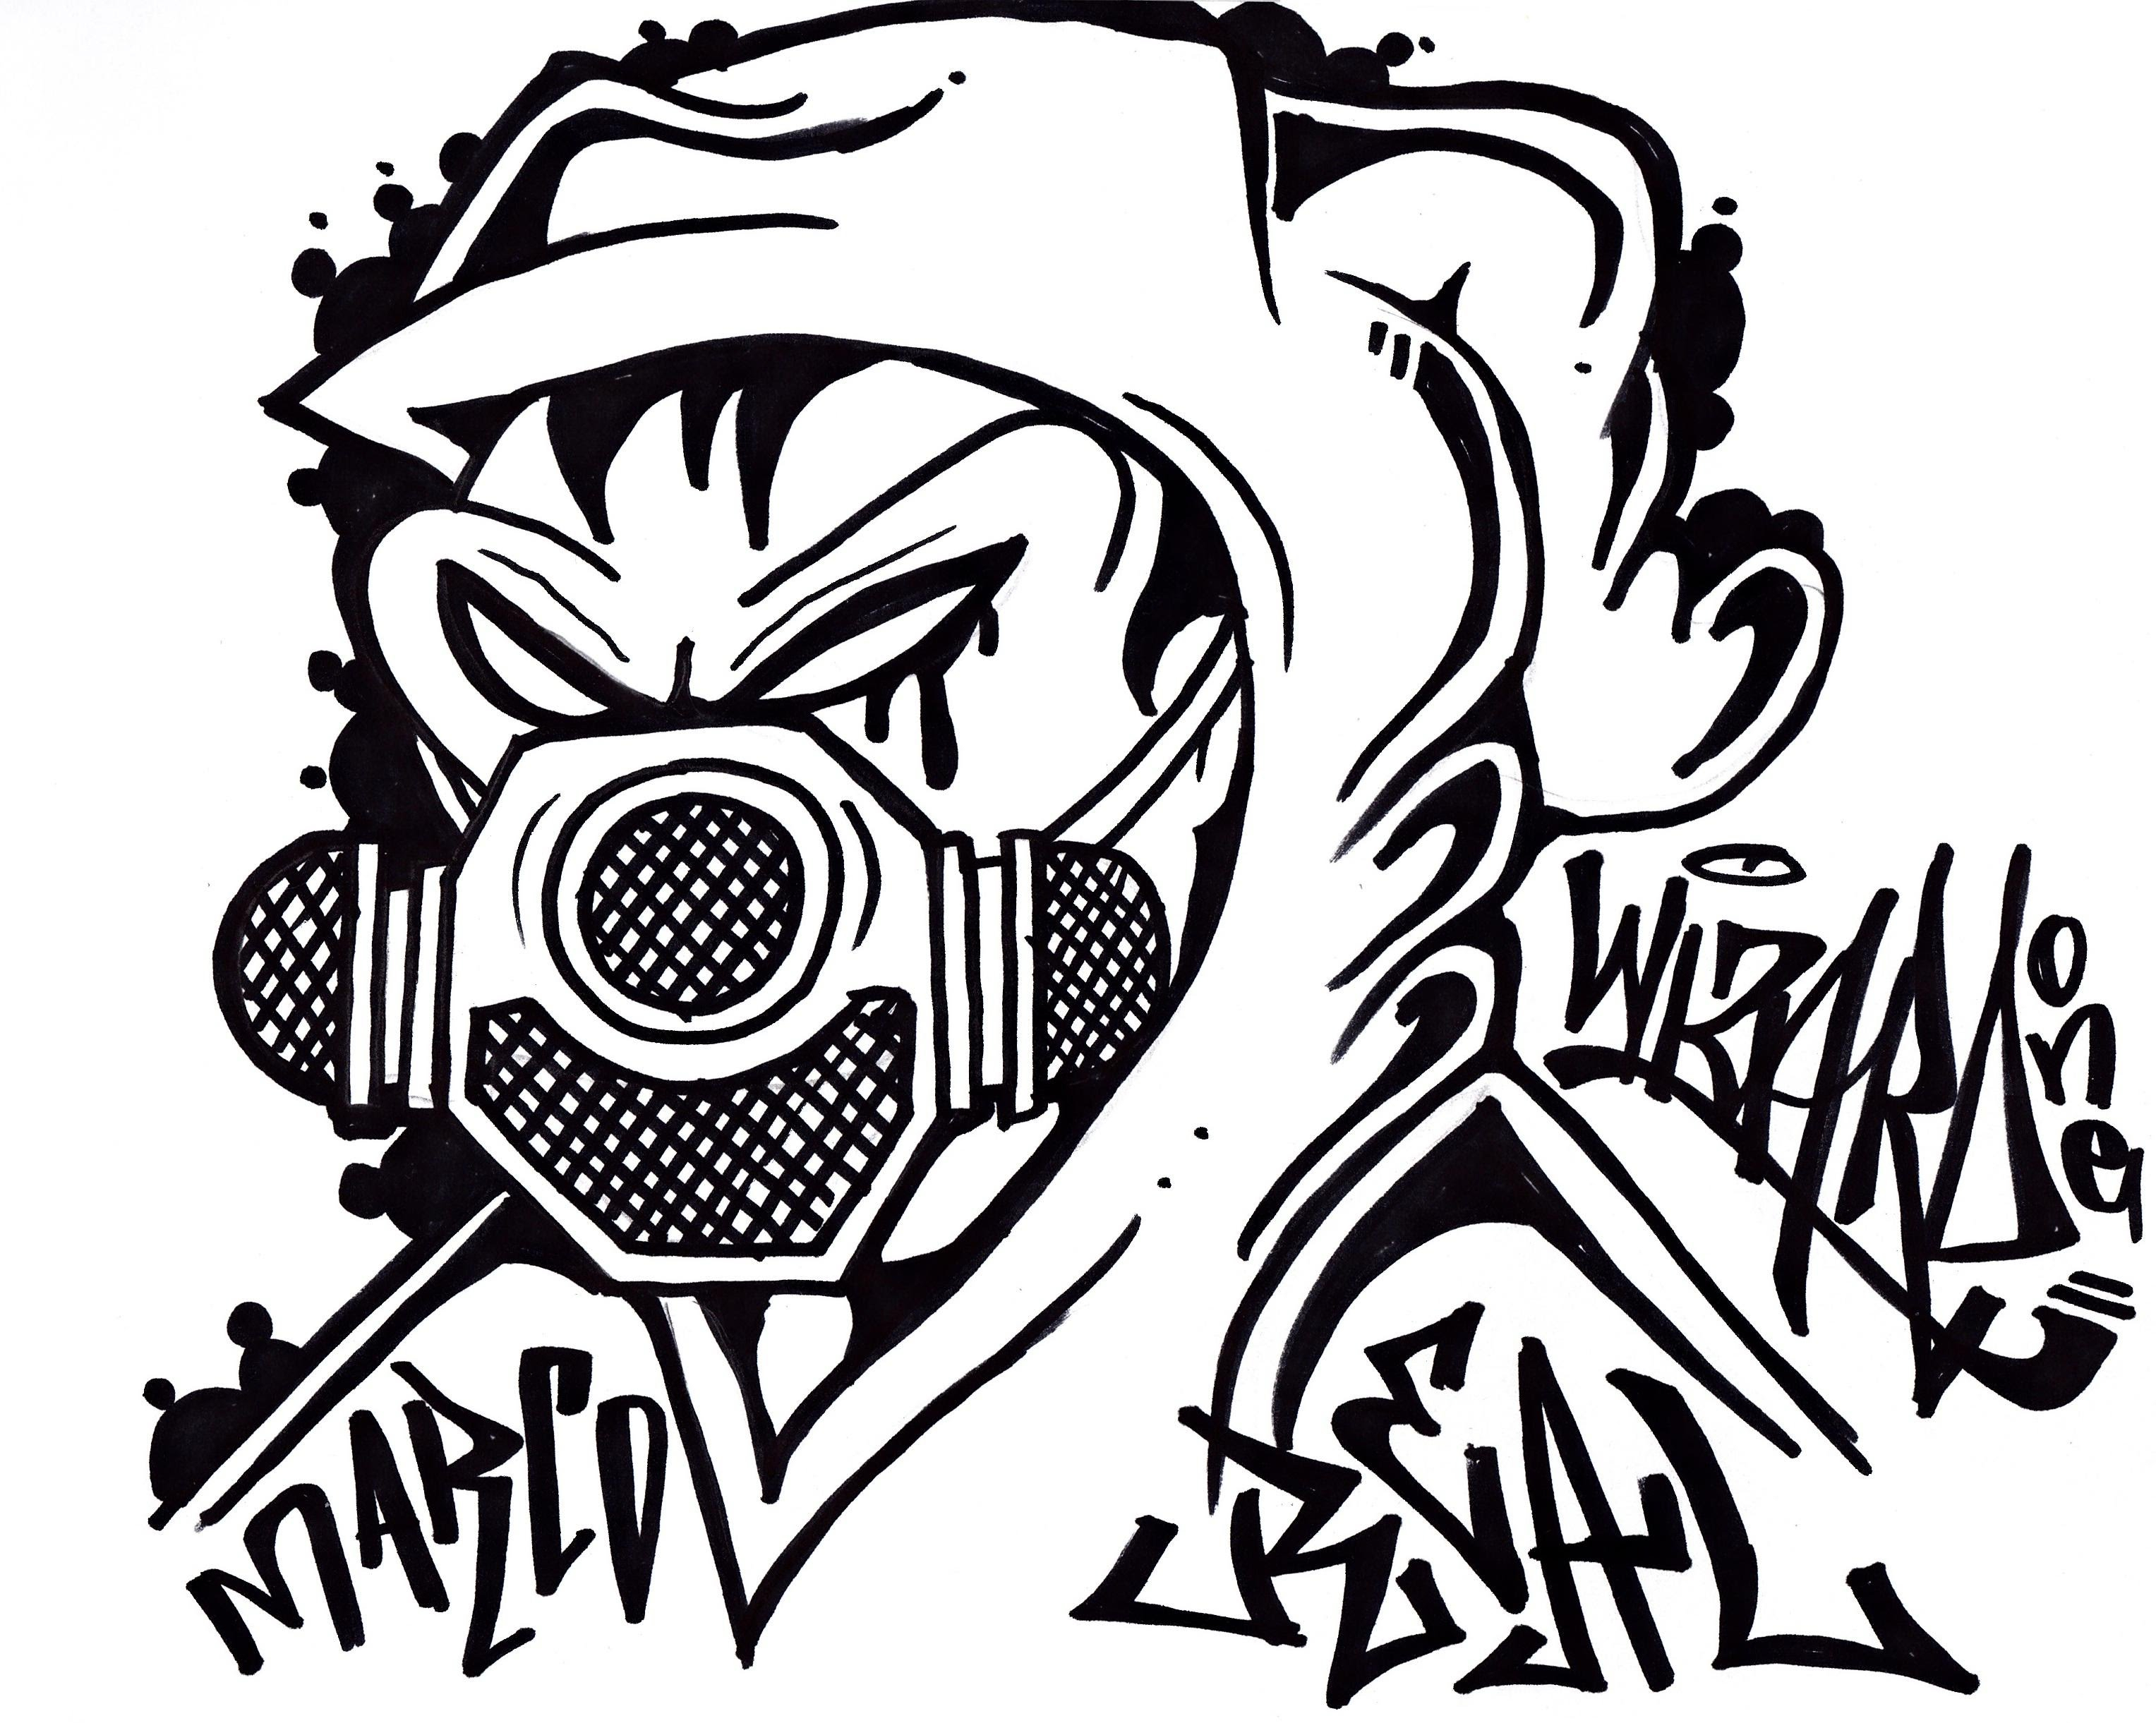 3055x2442 Graffiti Characters Gangster Skull How To Draw A Gas Mask Graffiti